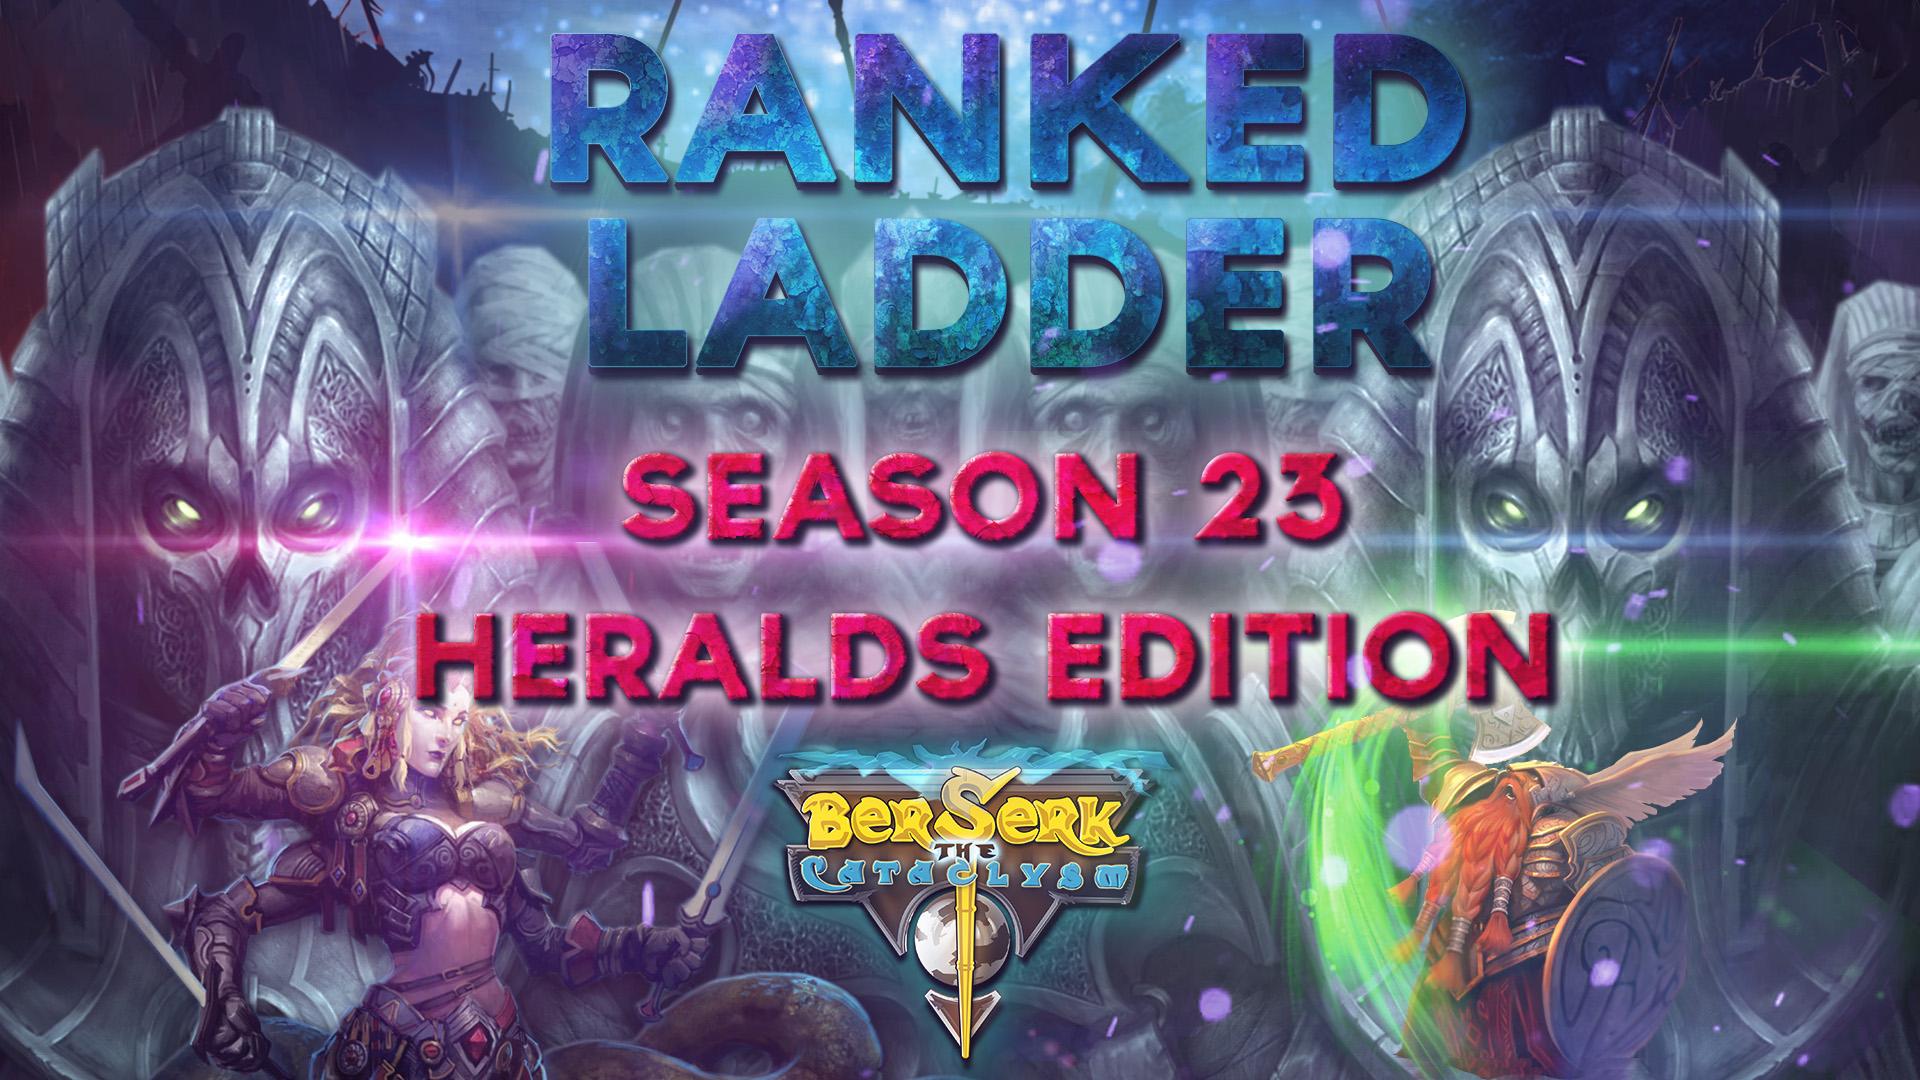 Ranked_LAdder_Season_23.jpg